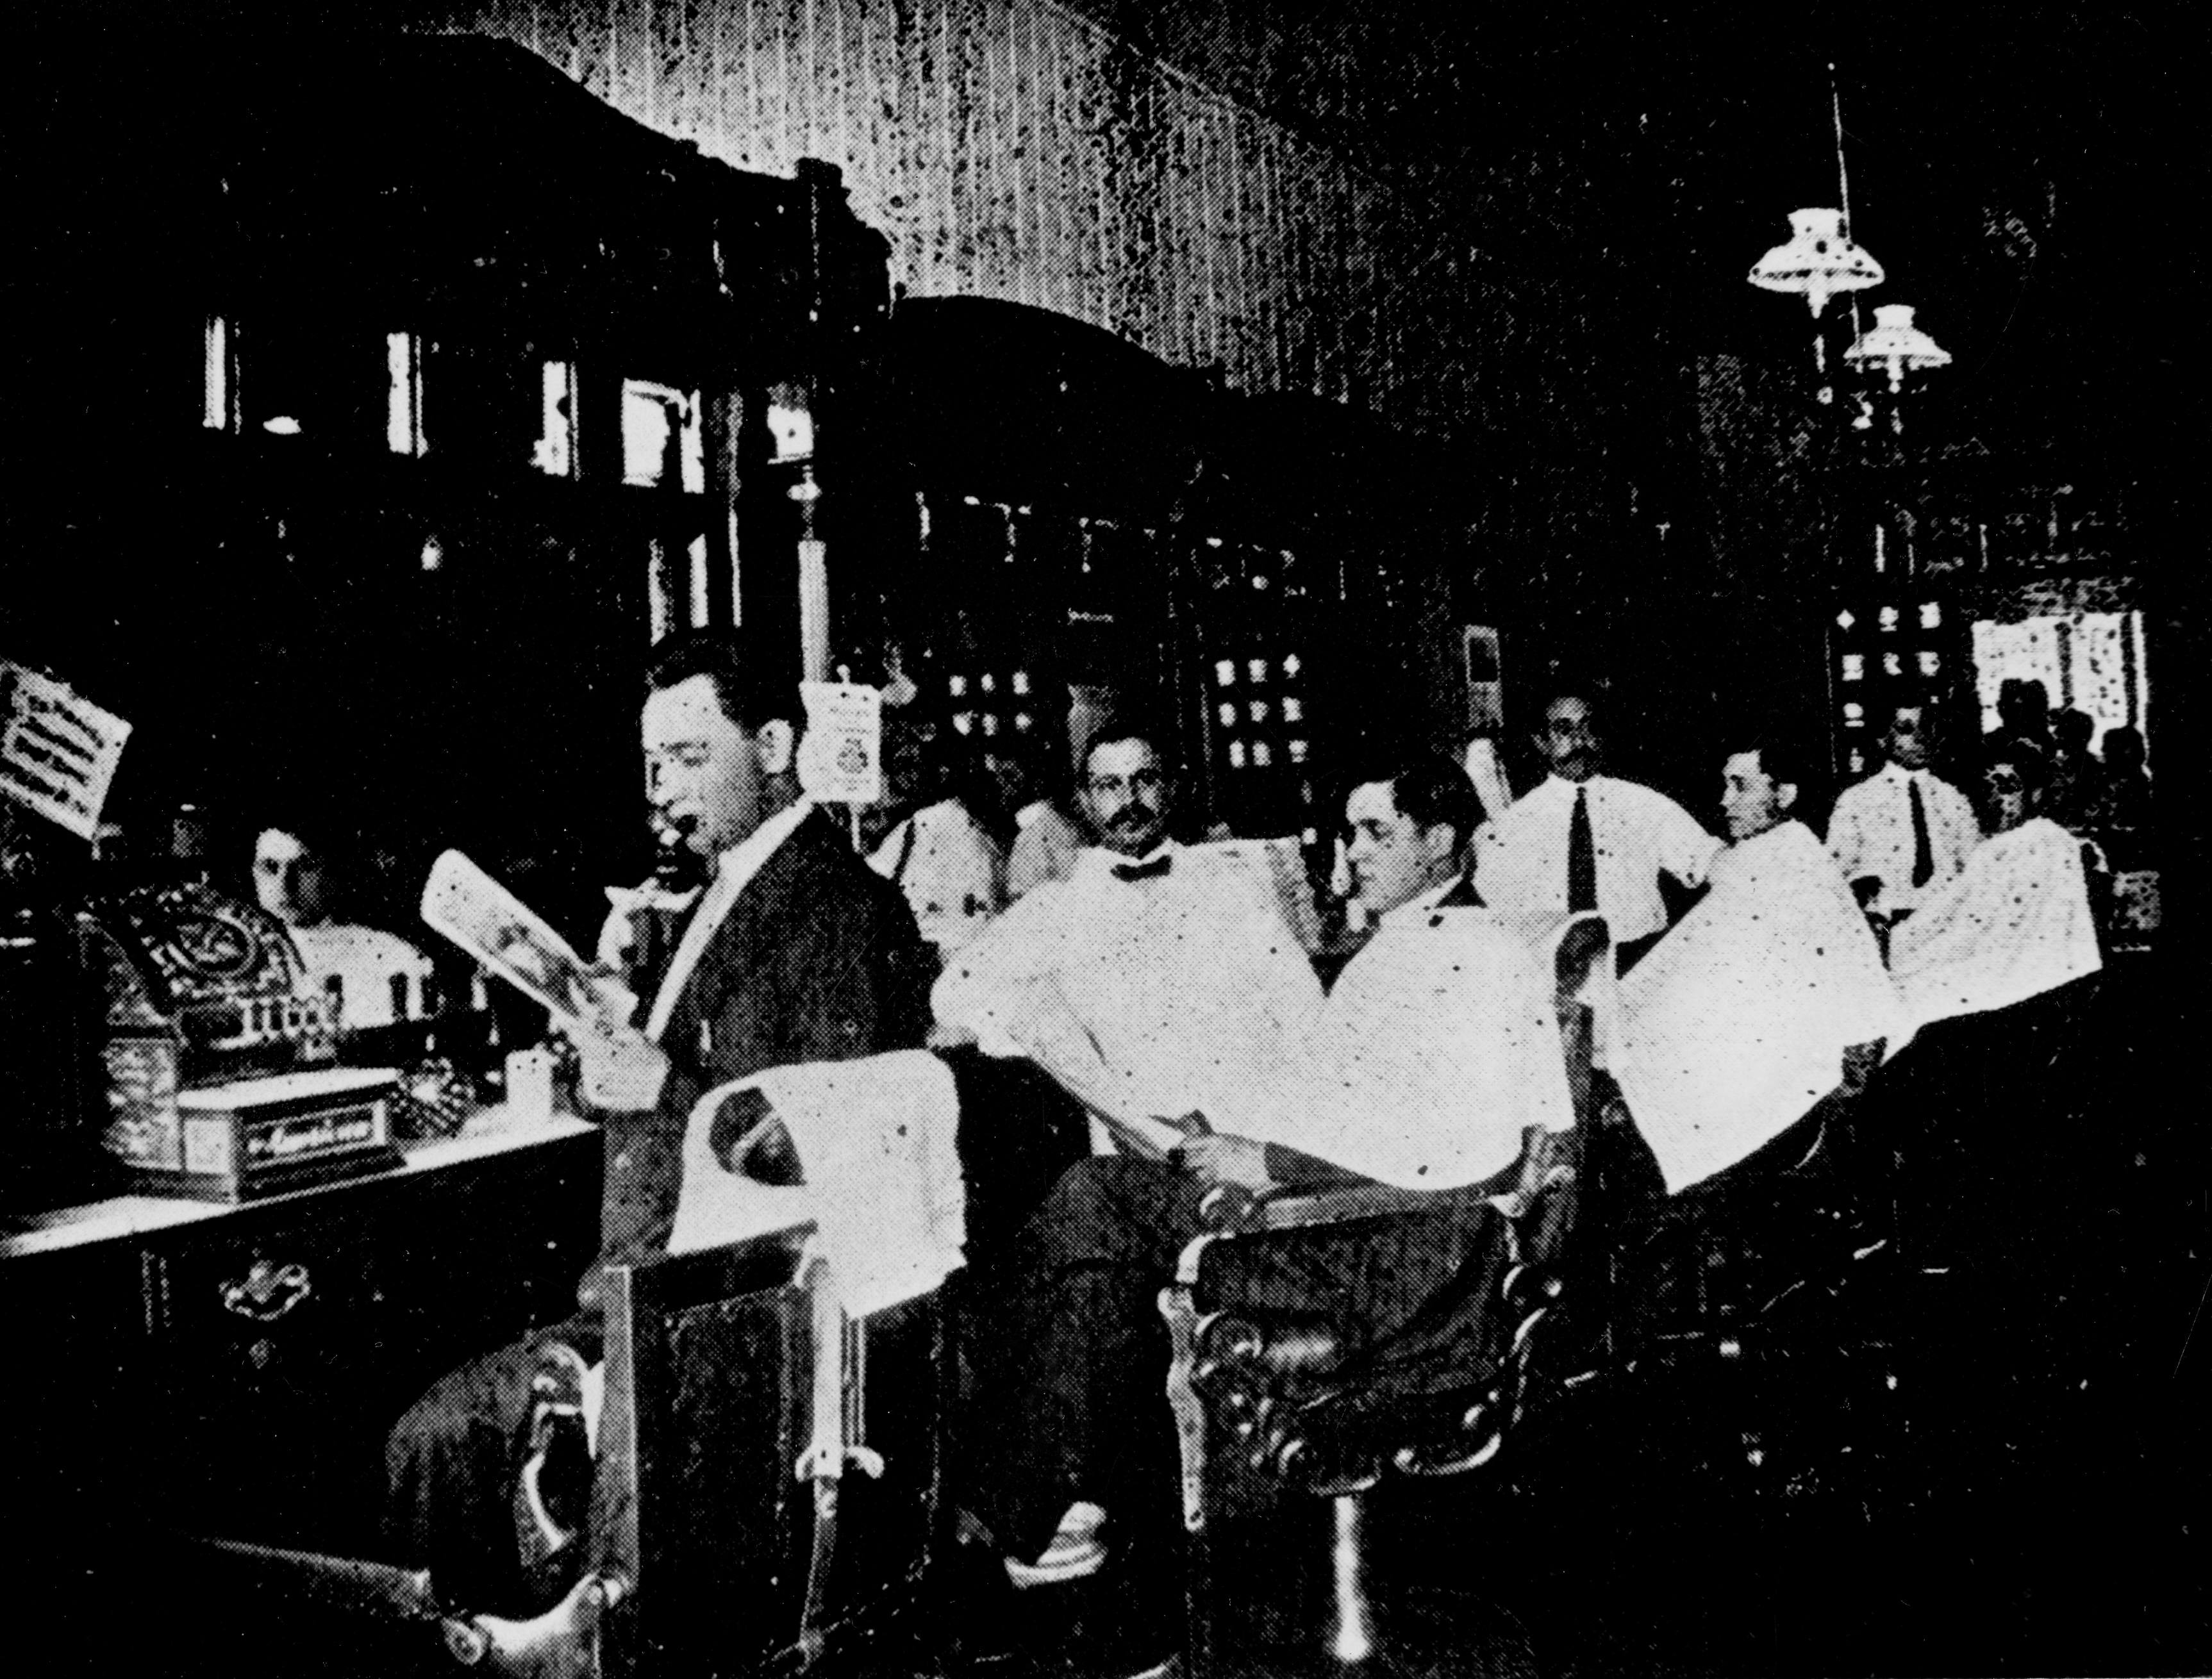 Italian Barbershop